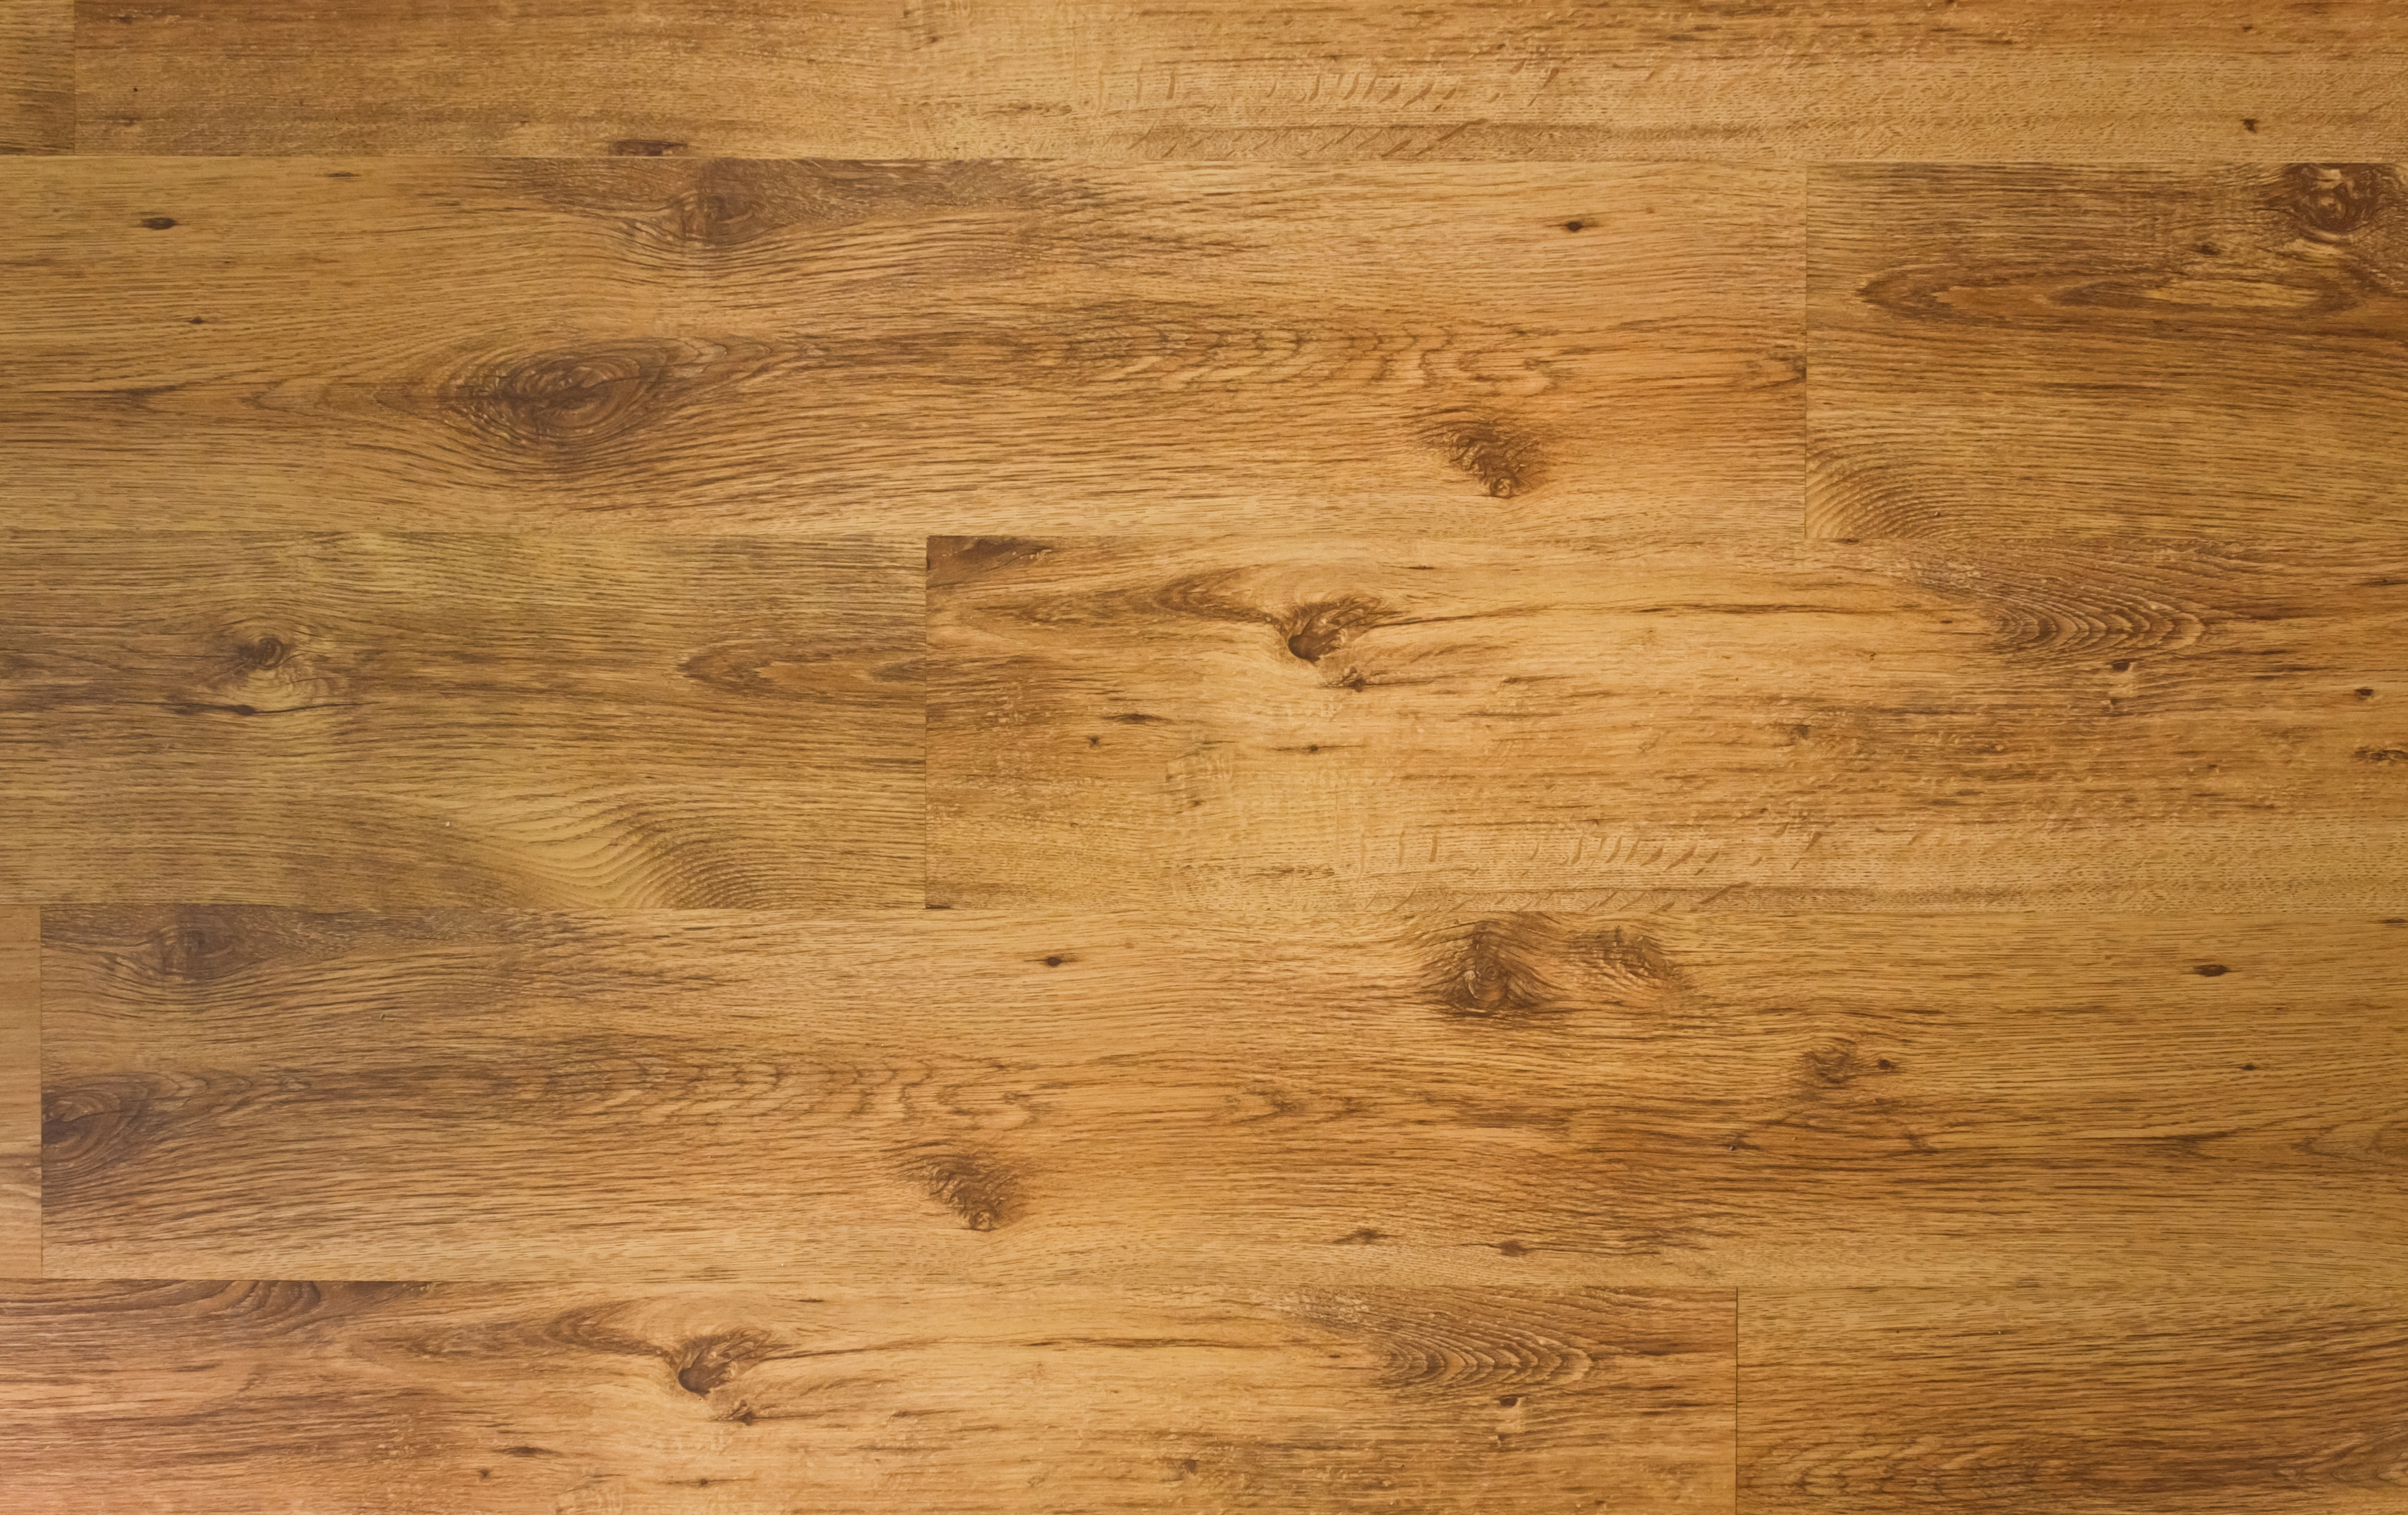 Wood Wallpaper 7970x5016